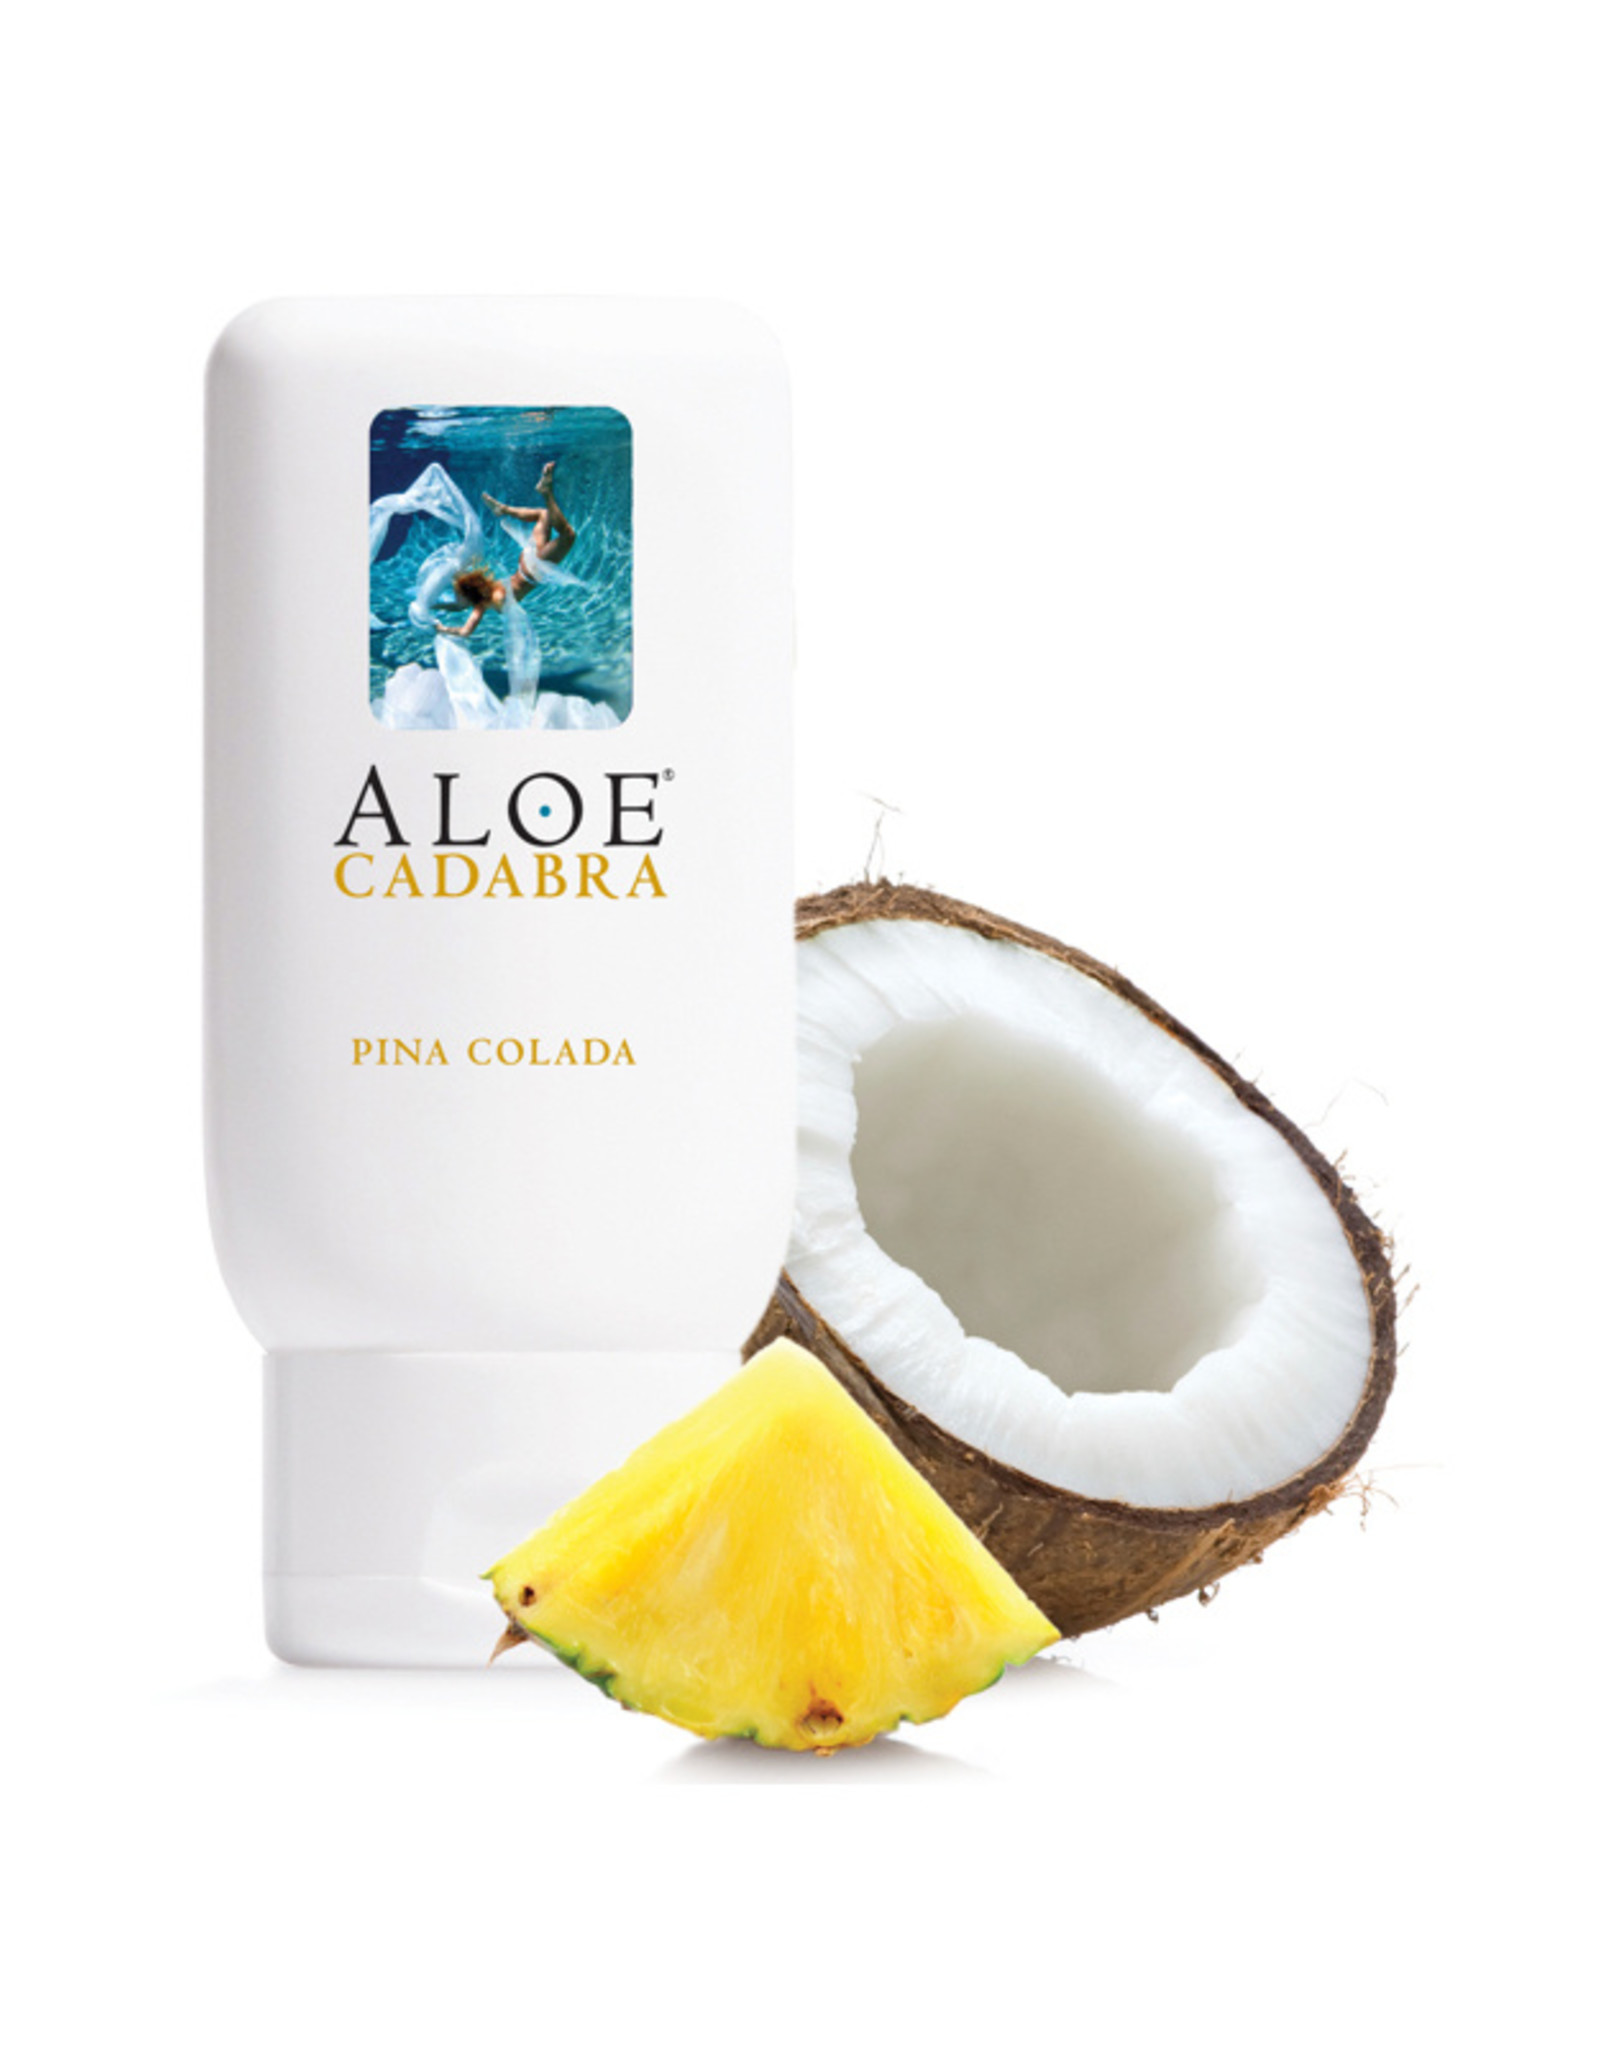 Aloe Cadabra Flavored Lubricant